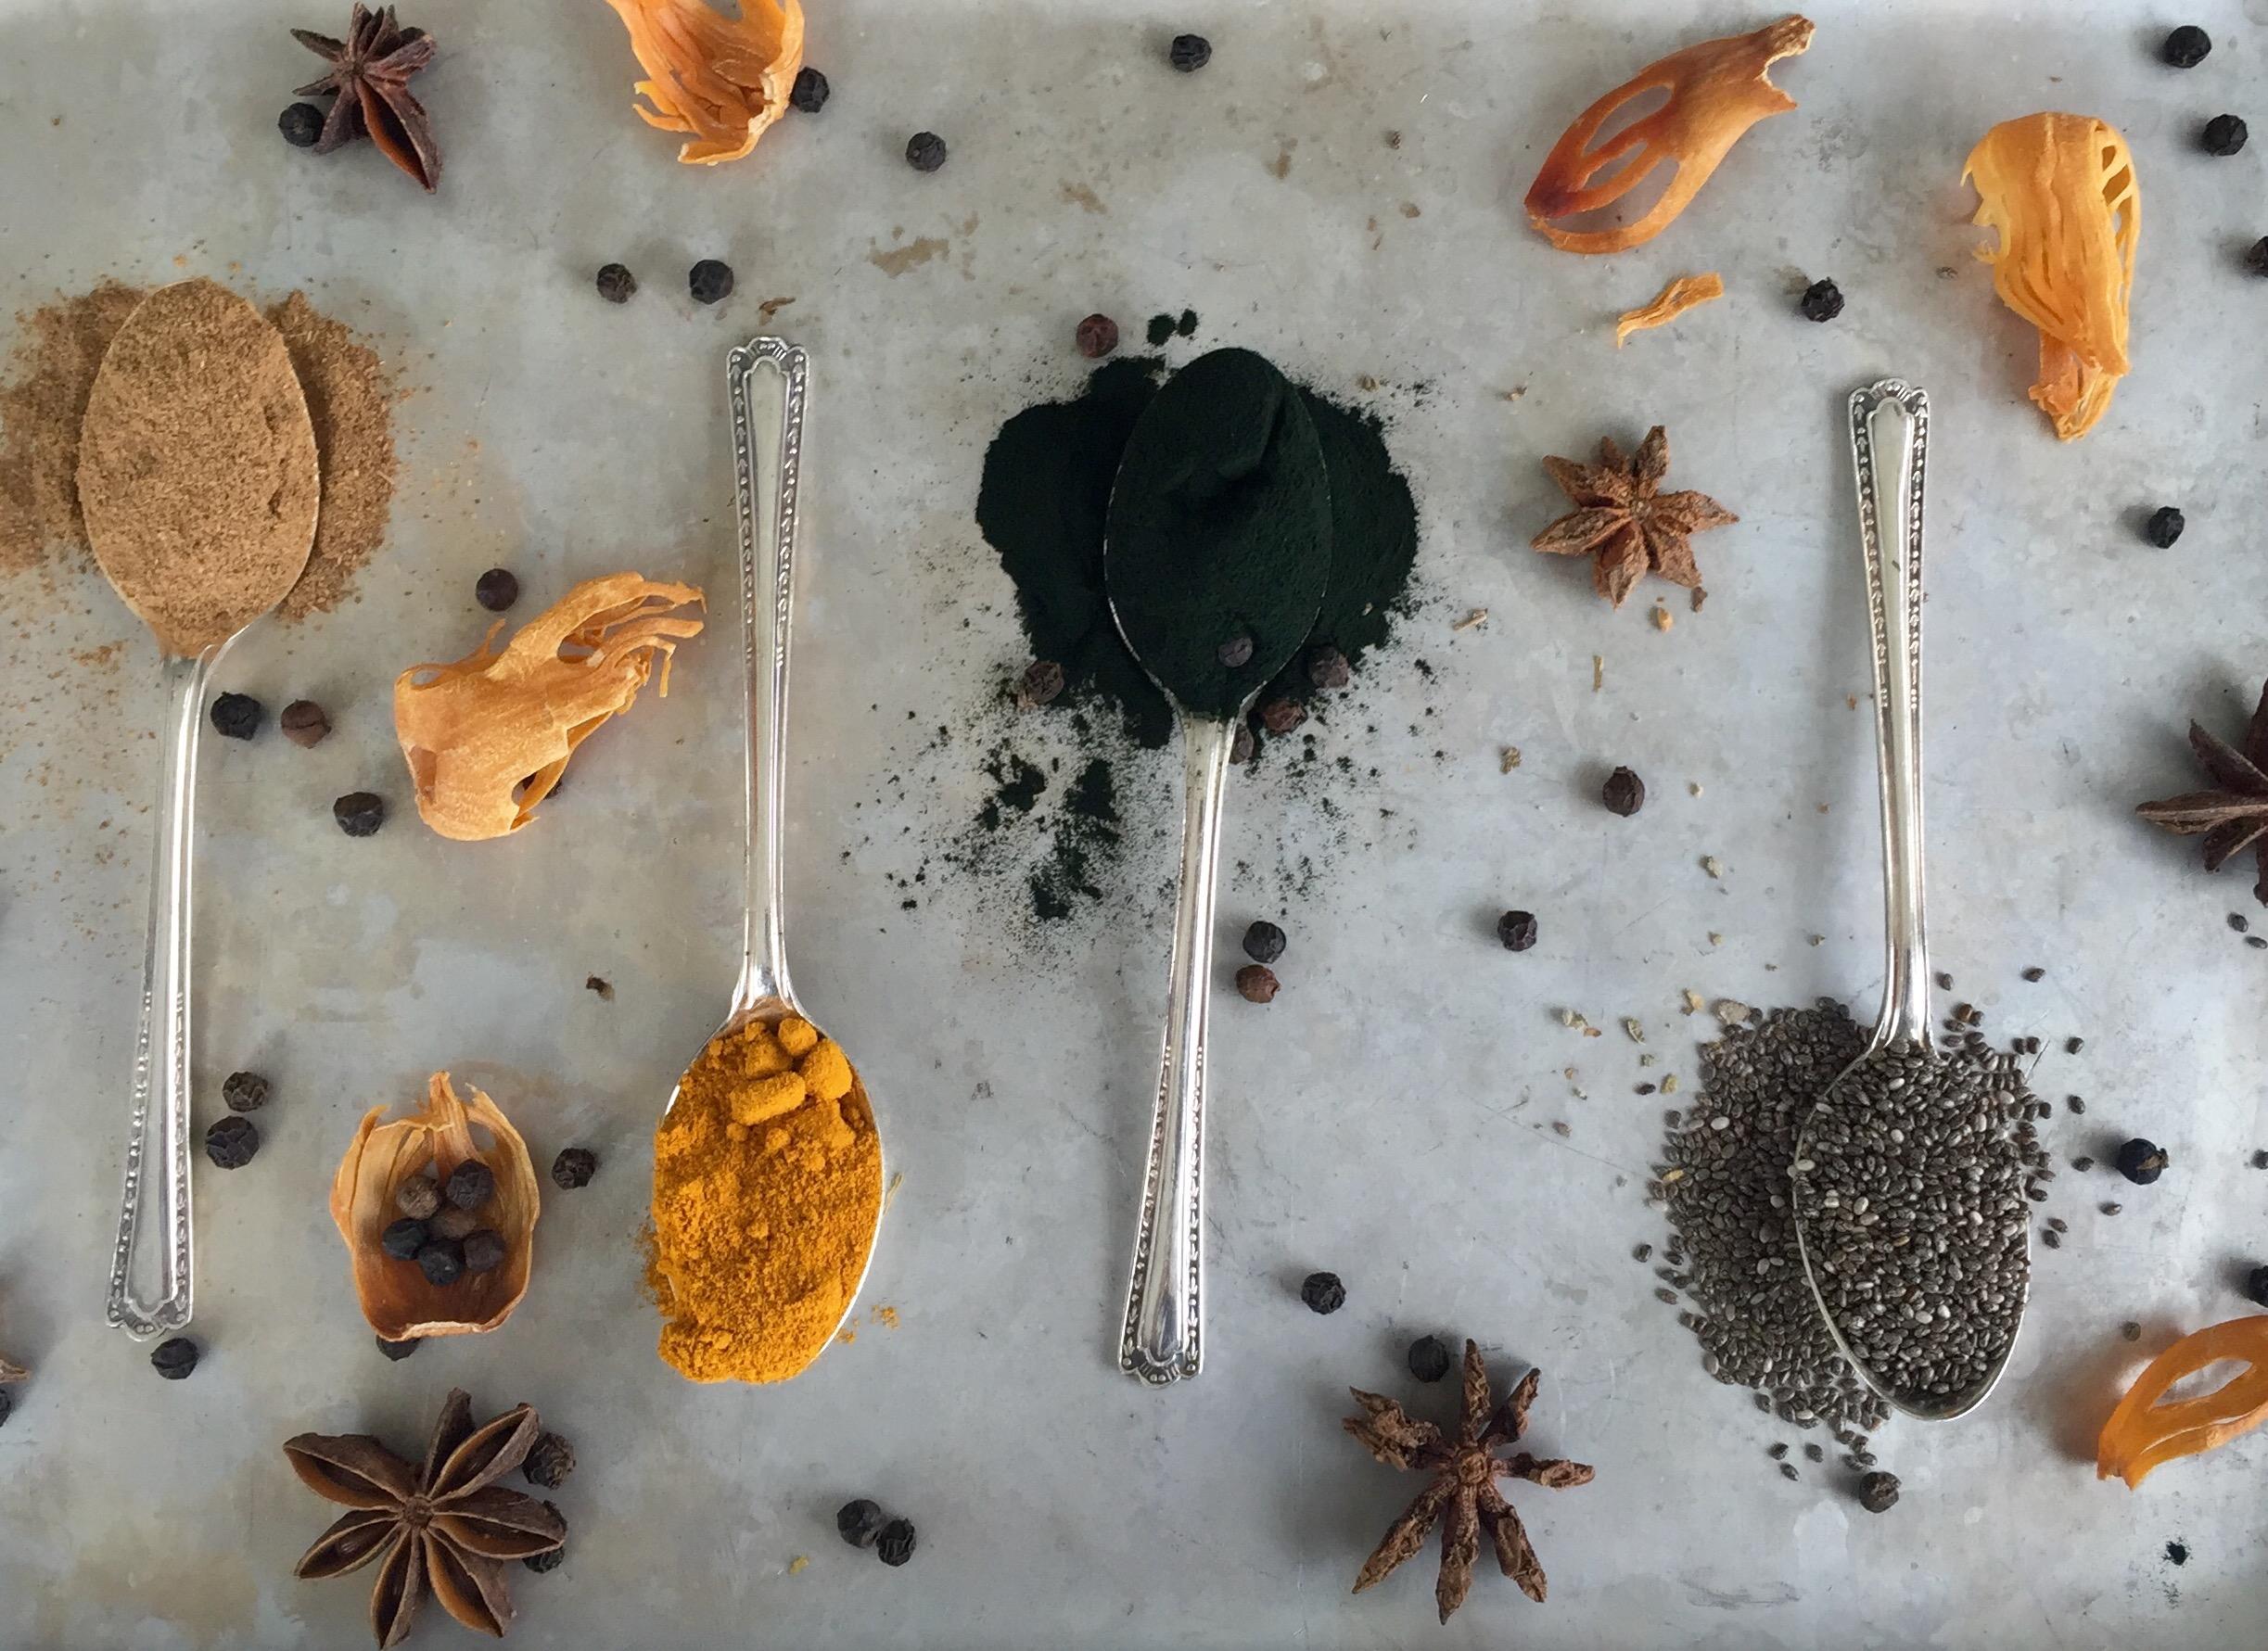 Cinnamon, turmeric, spirulina and chia seeds: for blood sugar levels, immunity and energy